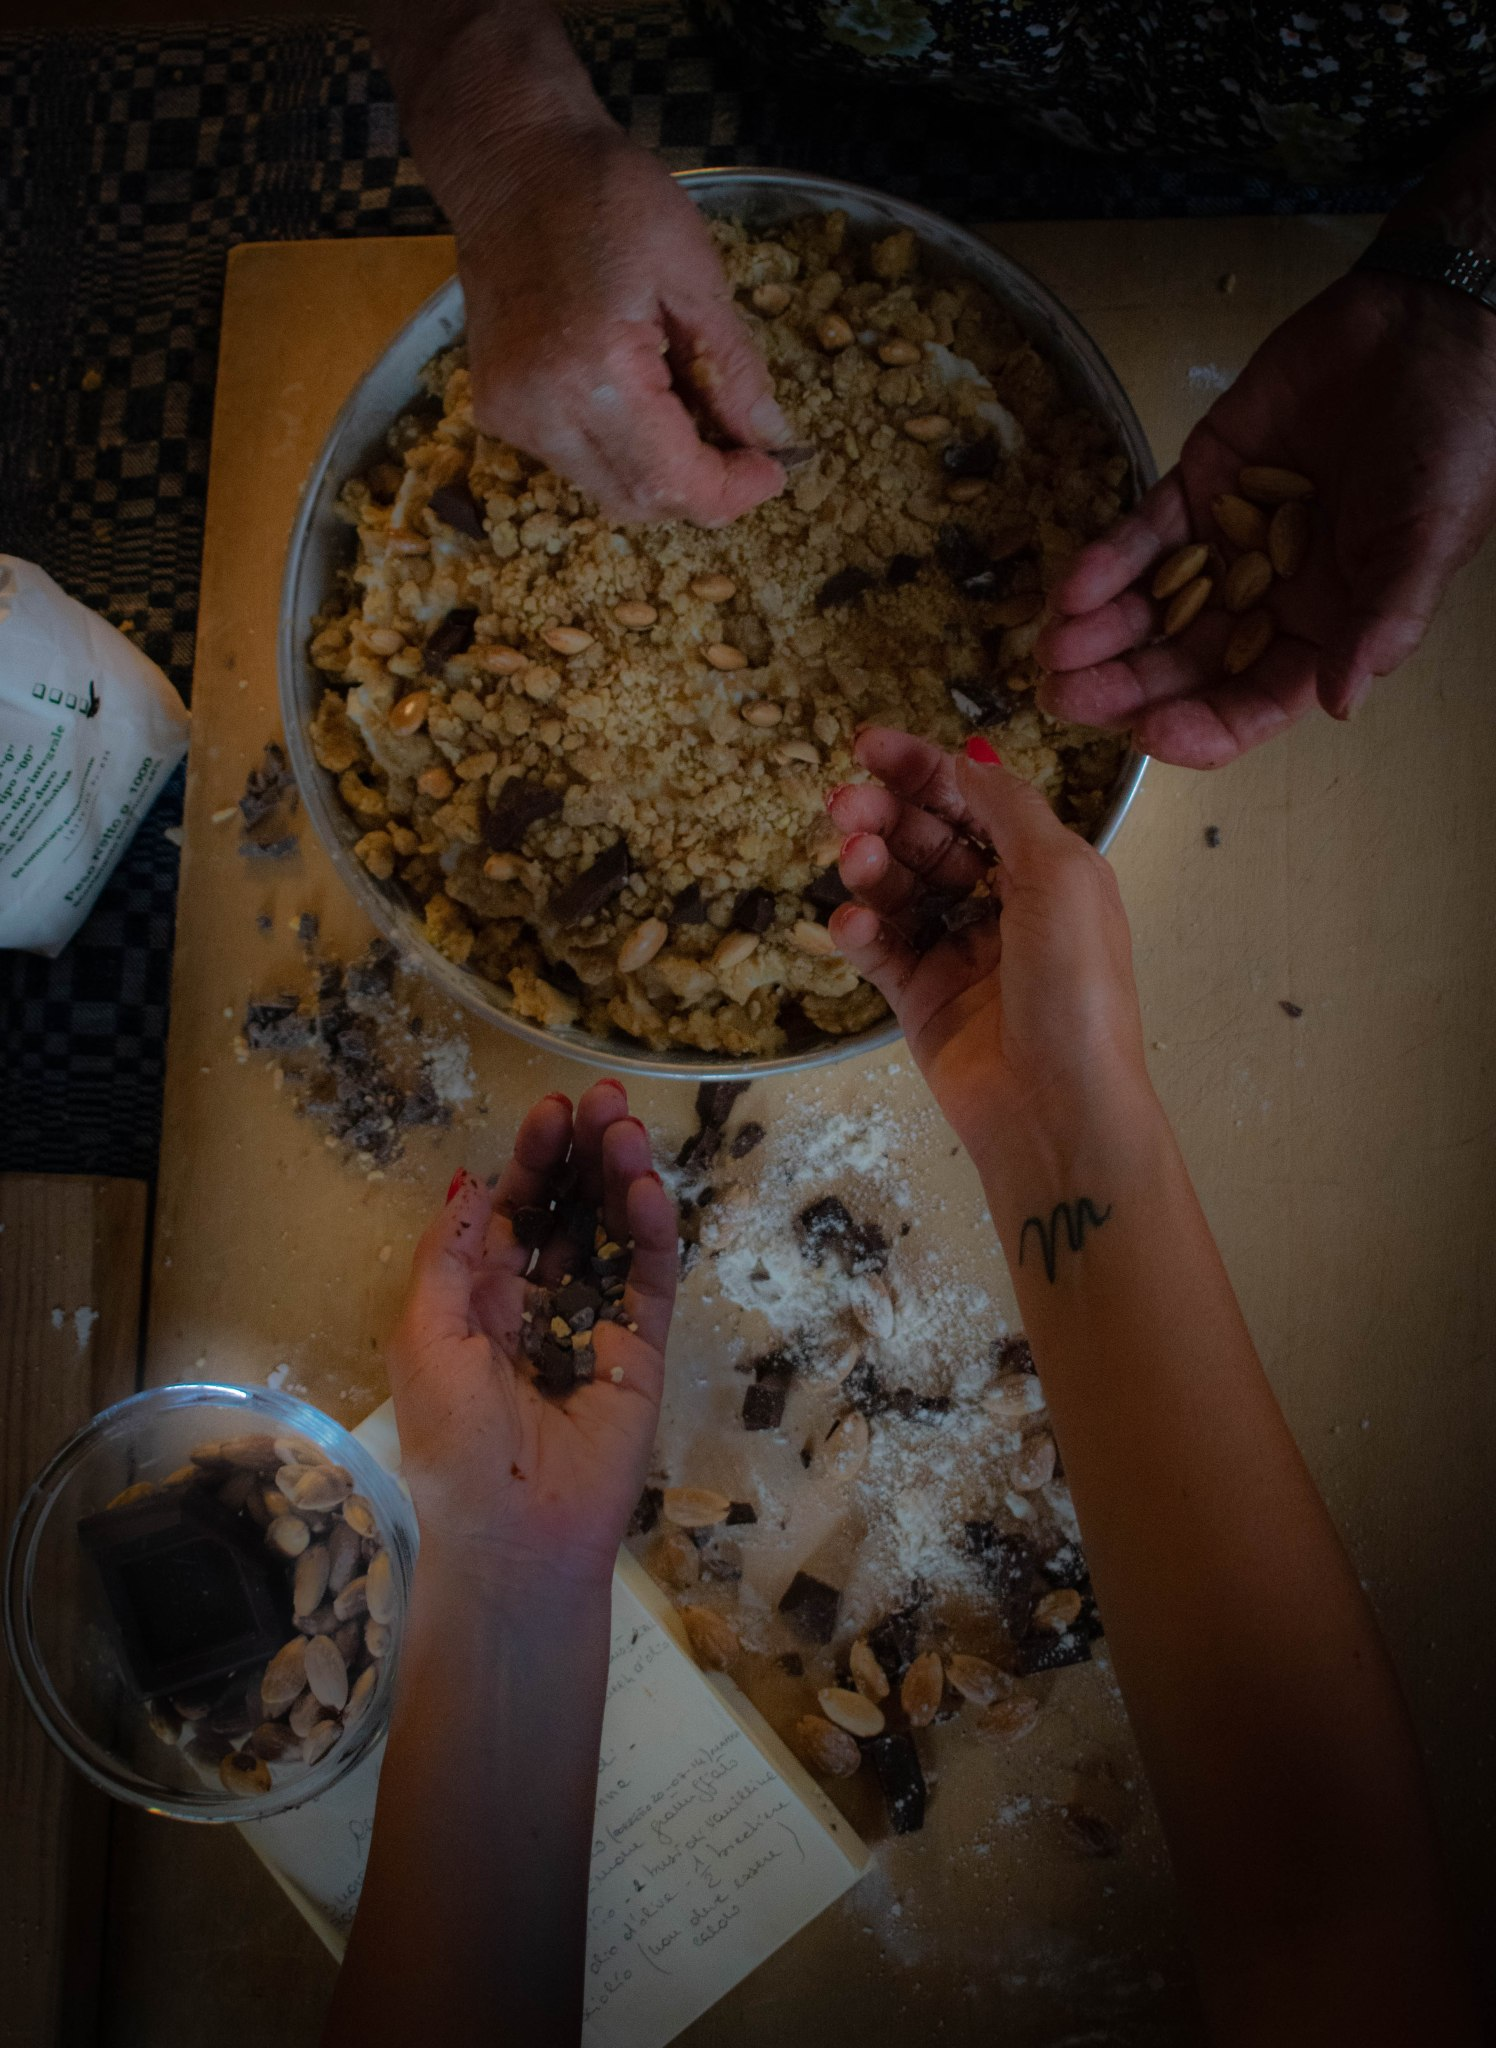 crumbled chocolate preparation